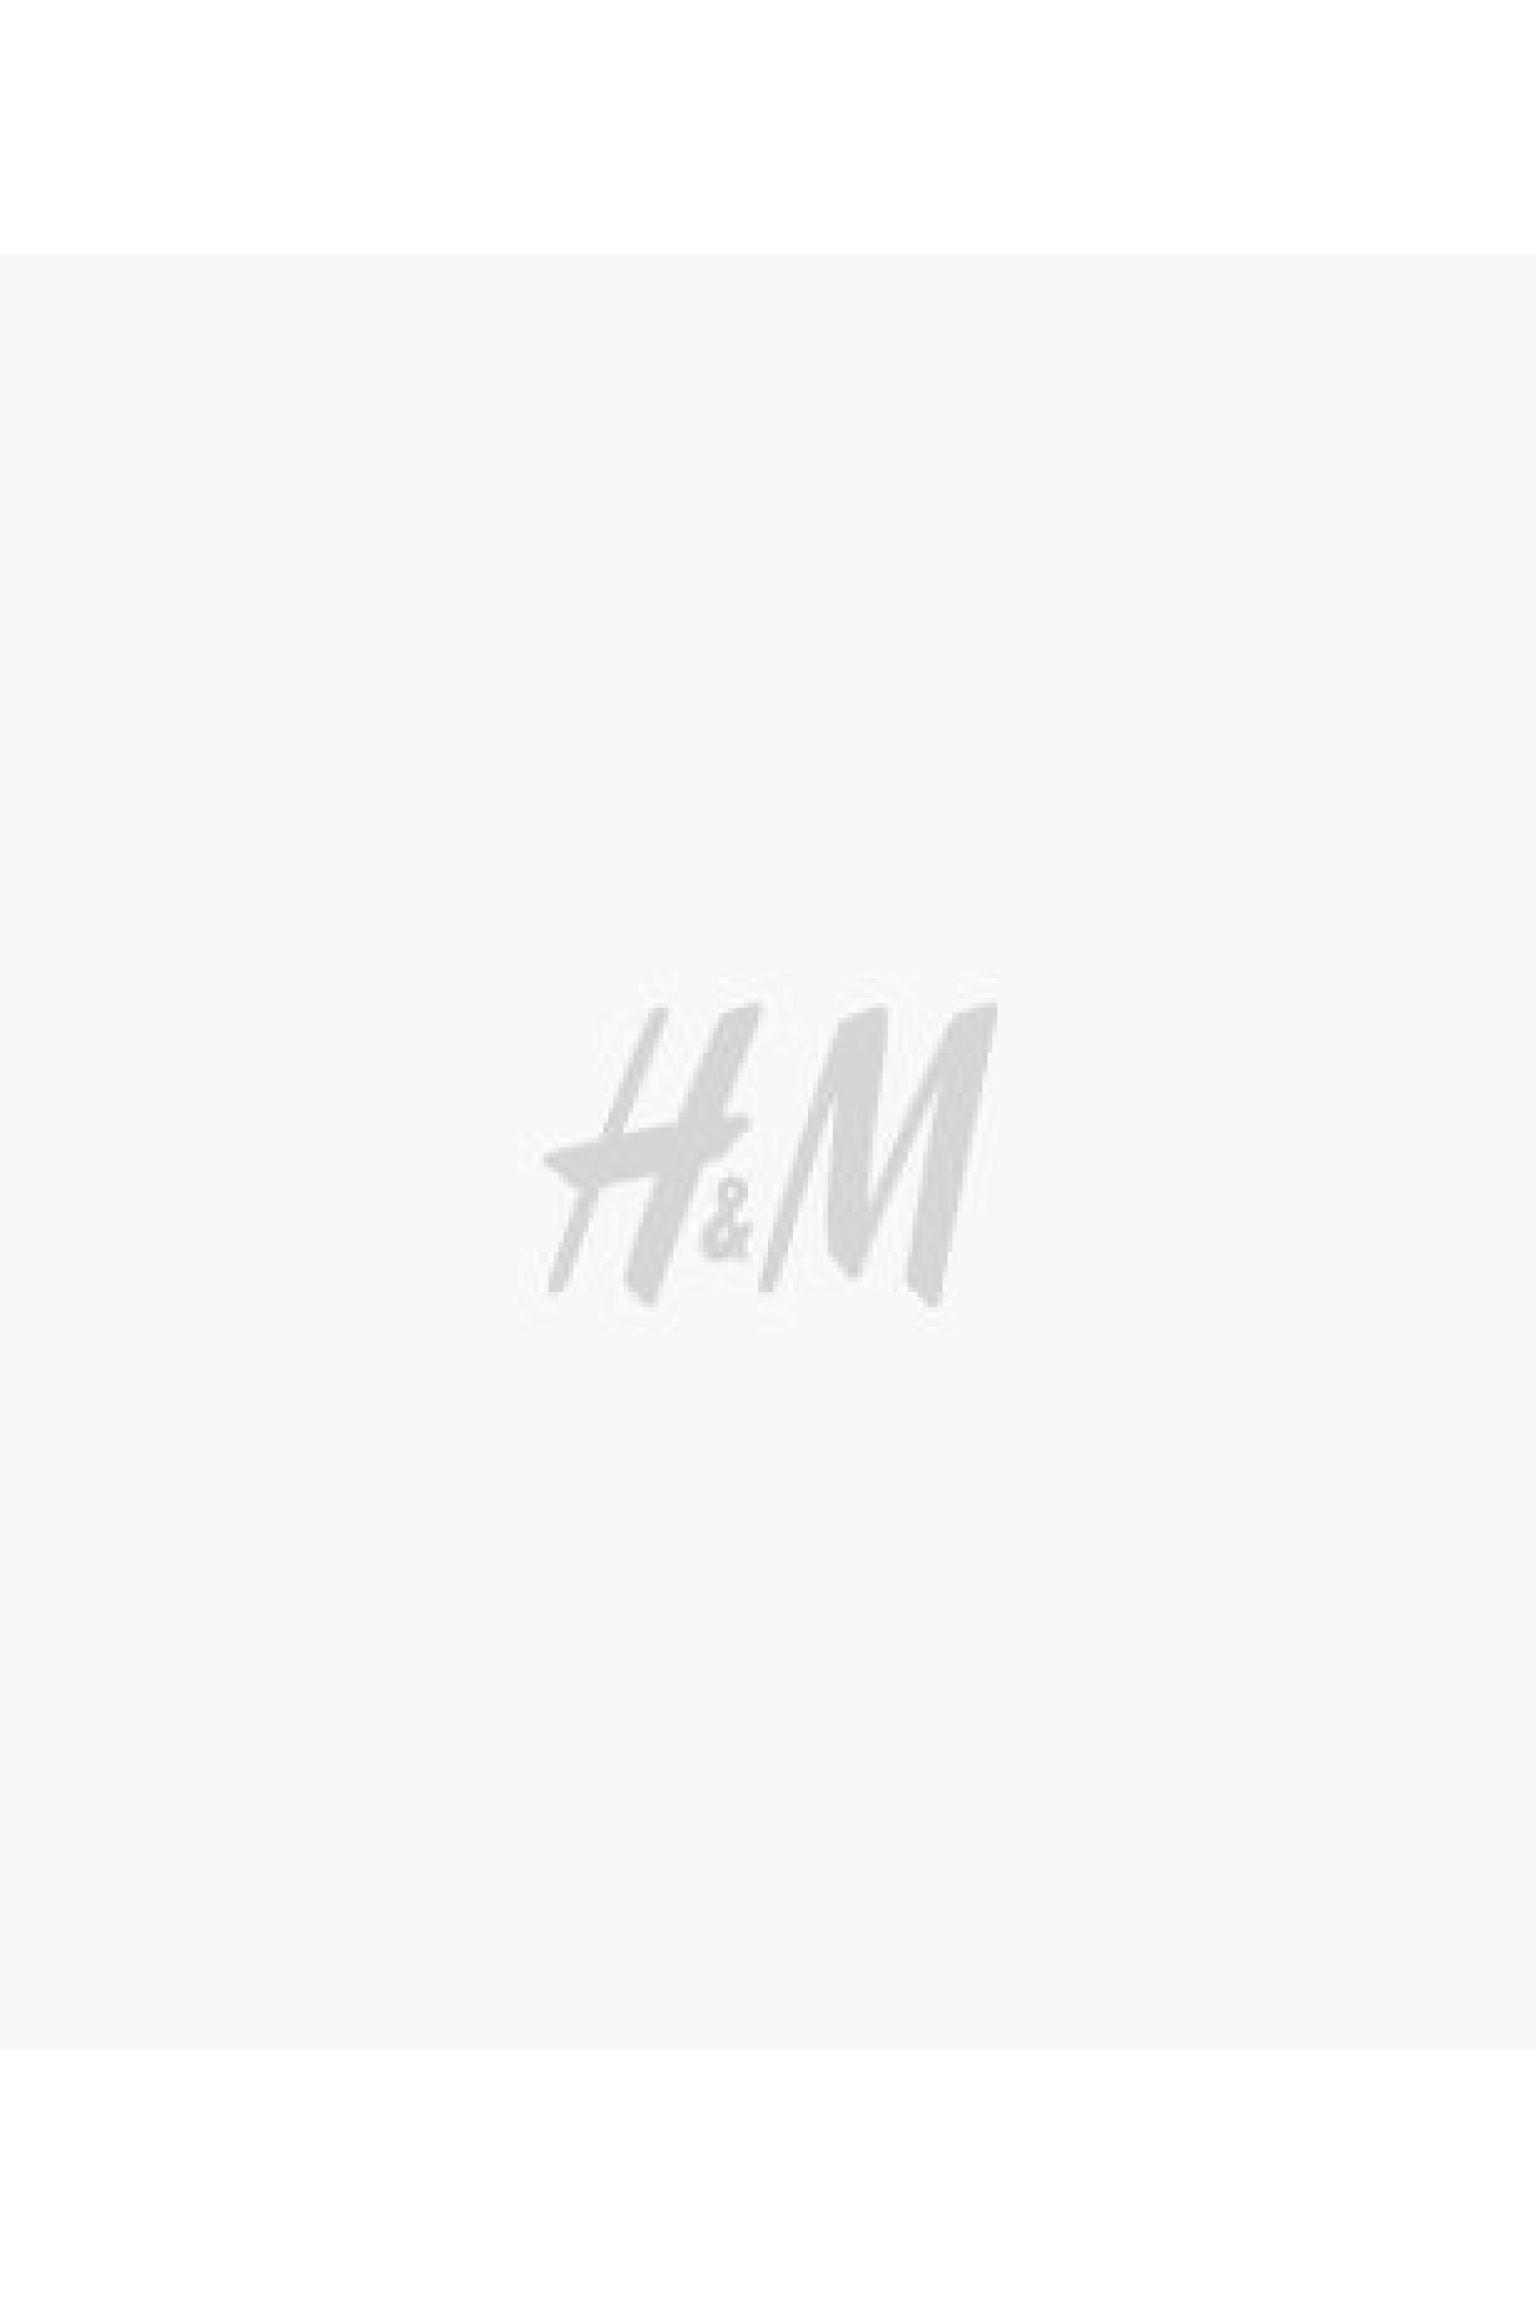 Denim Corset Top, £14.99, Lee x H&M